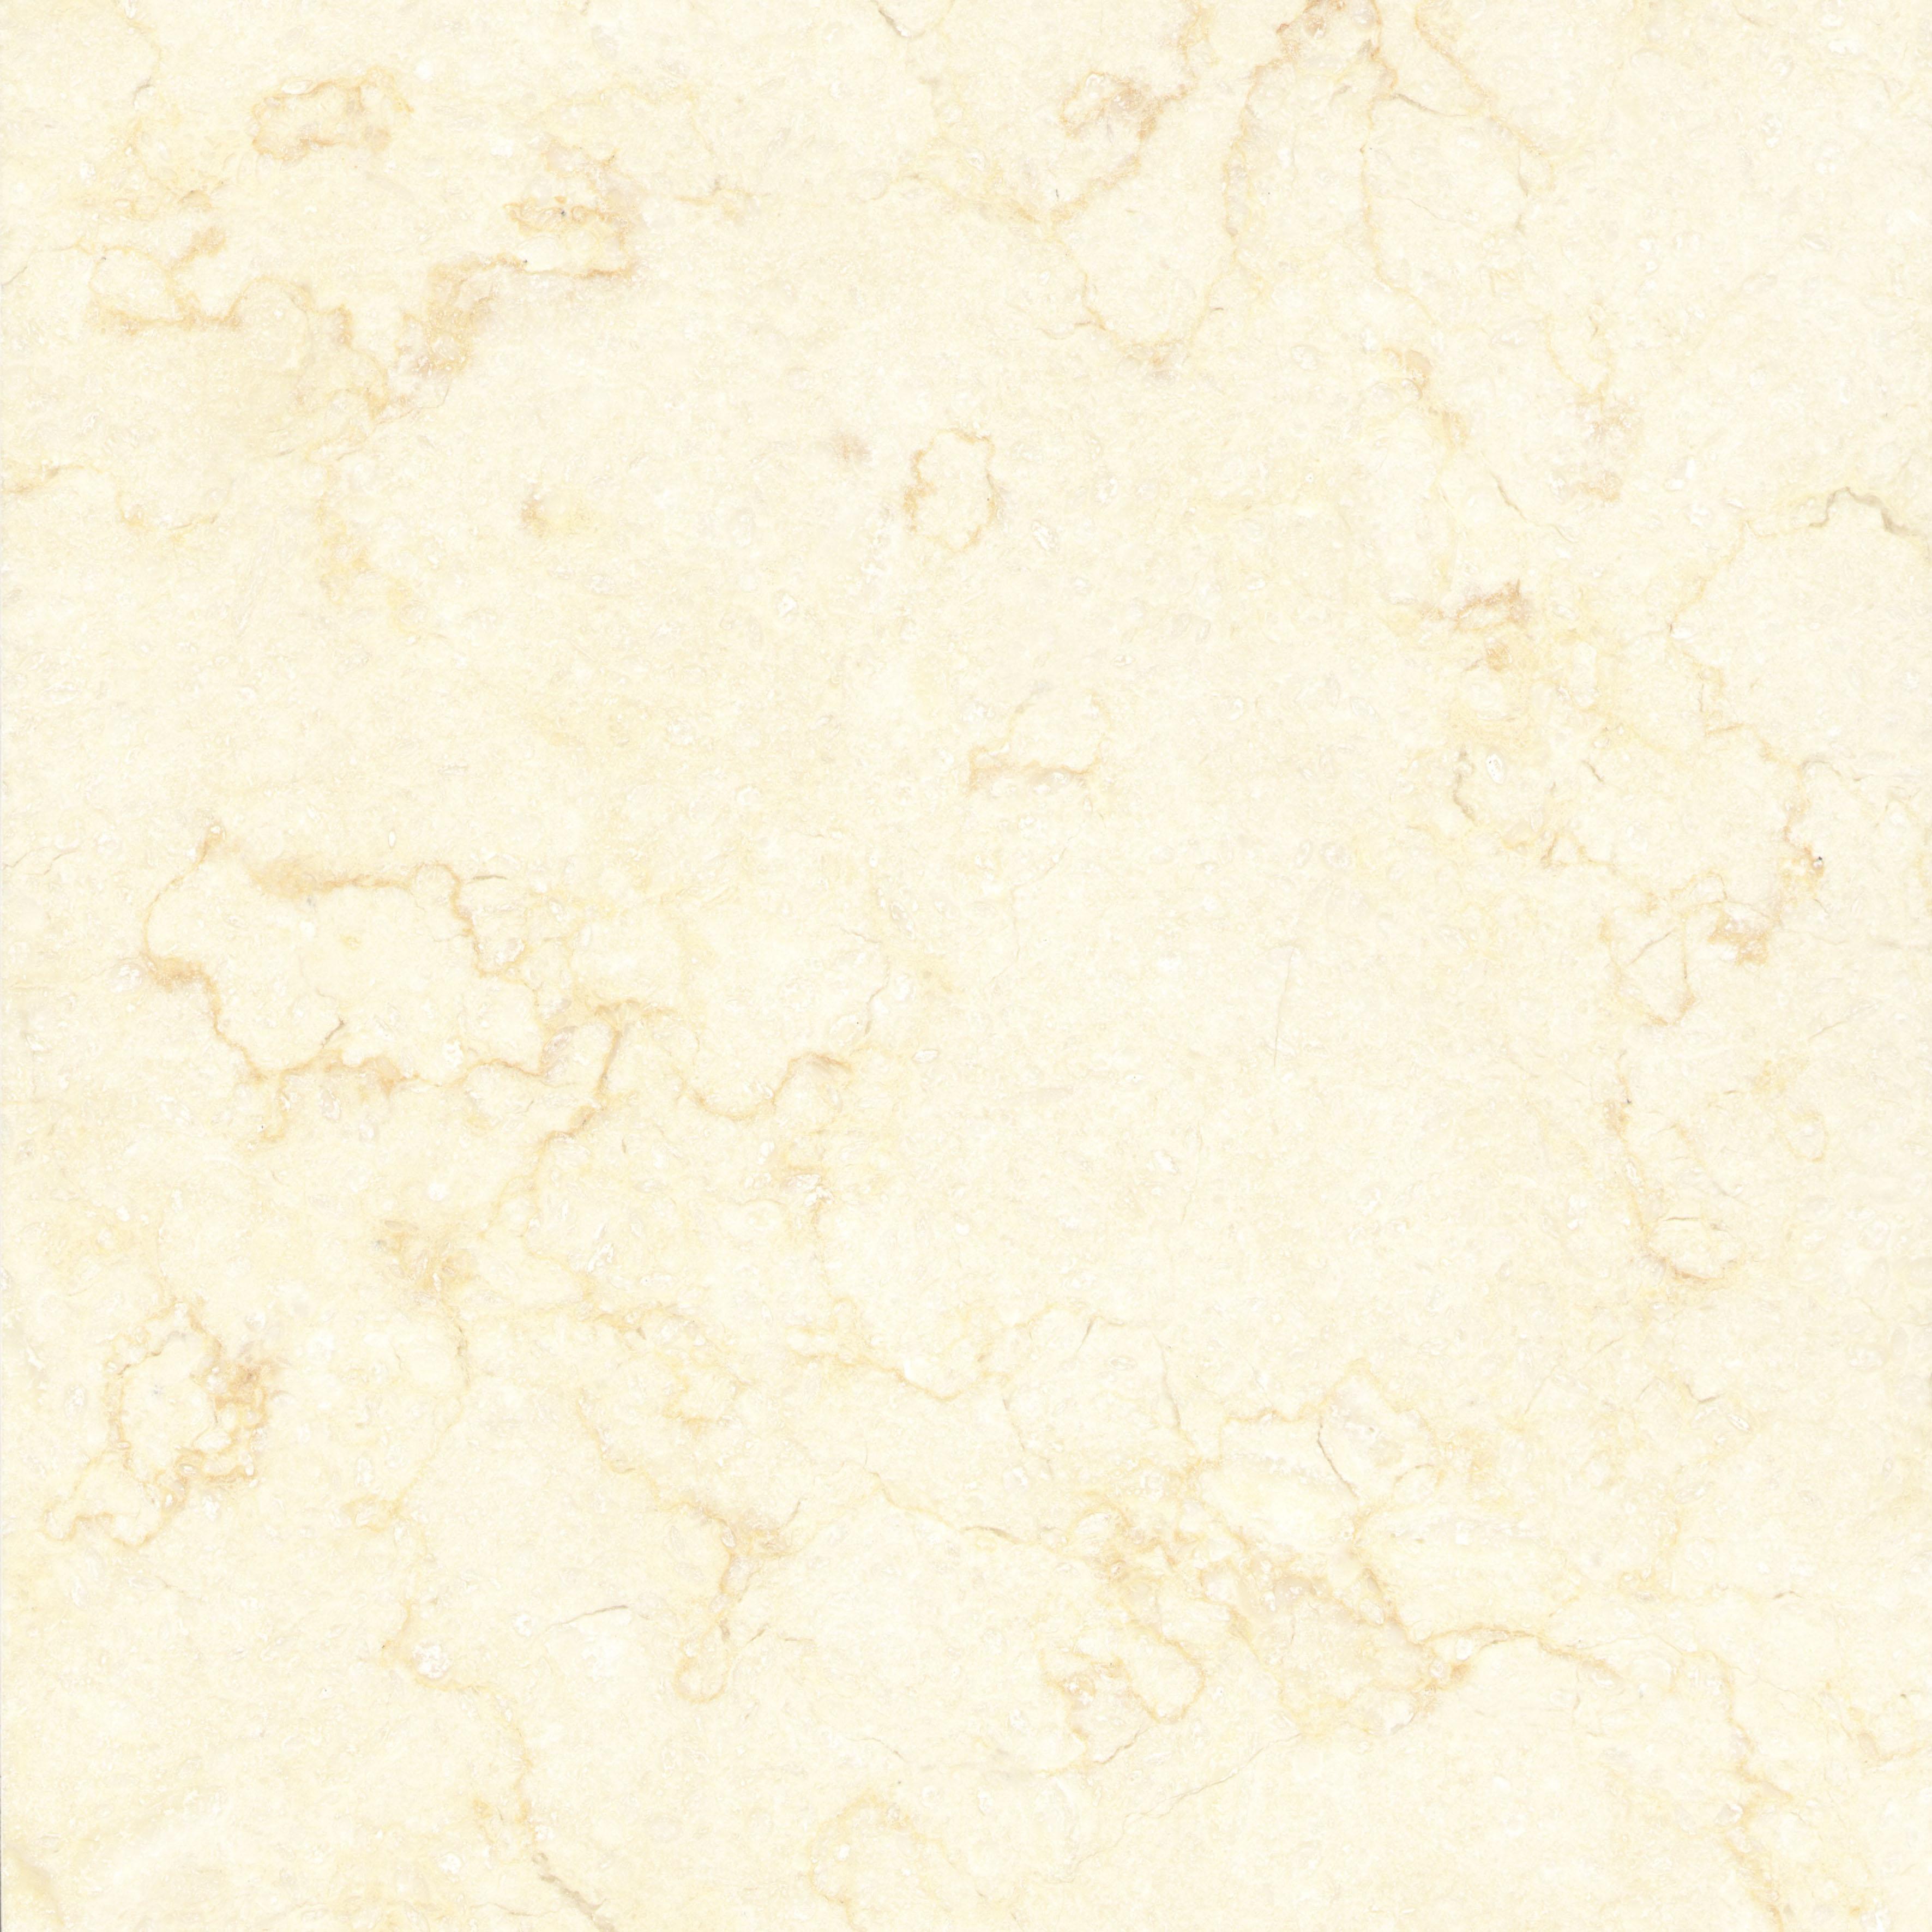 Dream Stone Egyptian Beige Marble Sunny Galala Sinai Pearl